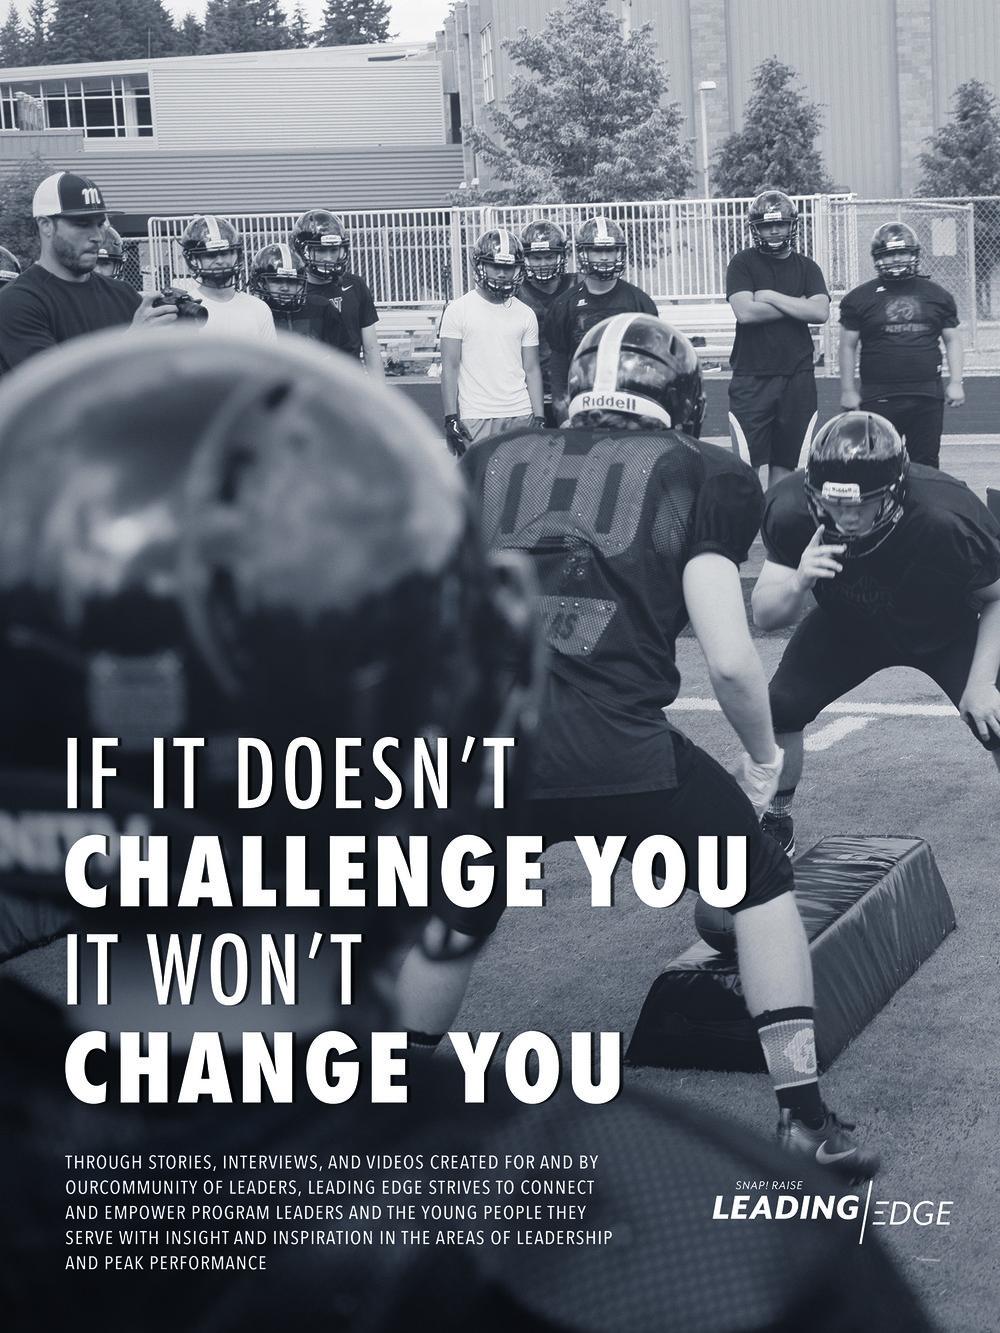 Leading Edge Quote Poster_Challenge_v03_for web.jpg